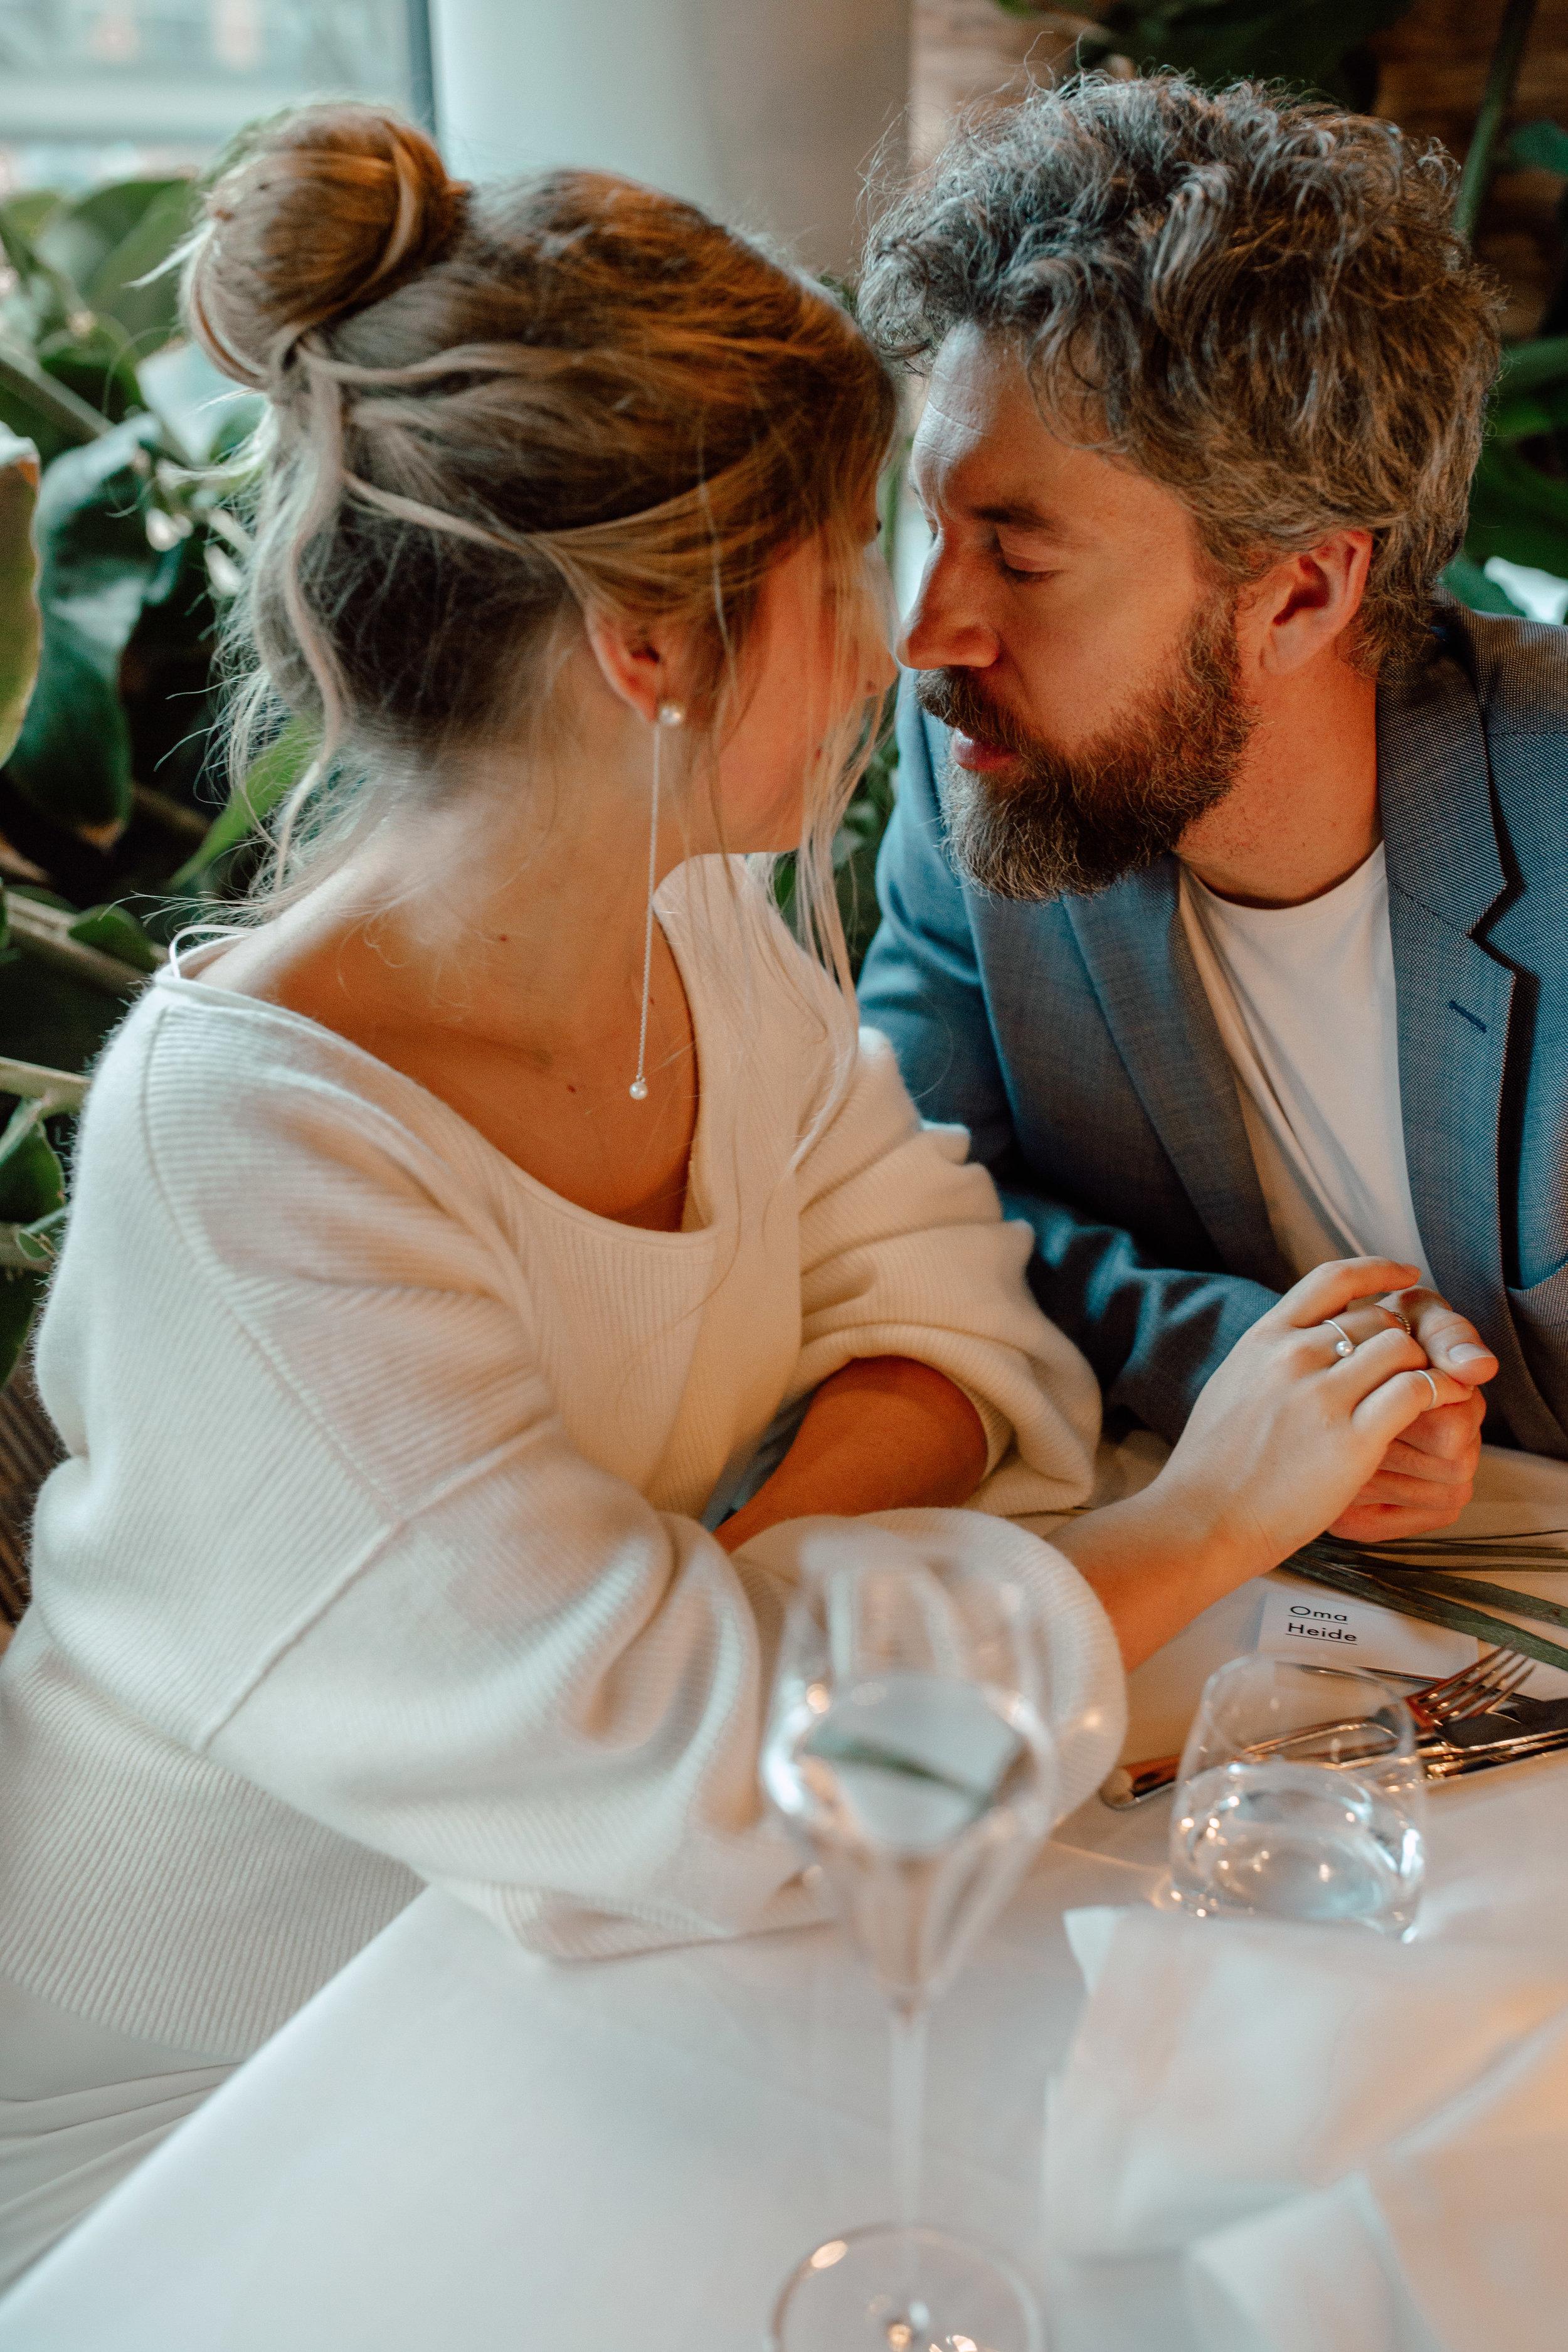 hamburg-greenery-the-saums-wedding-fashion-photography-96.jpg